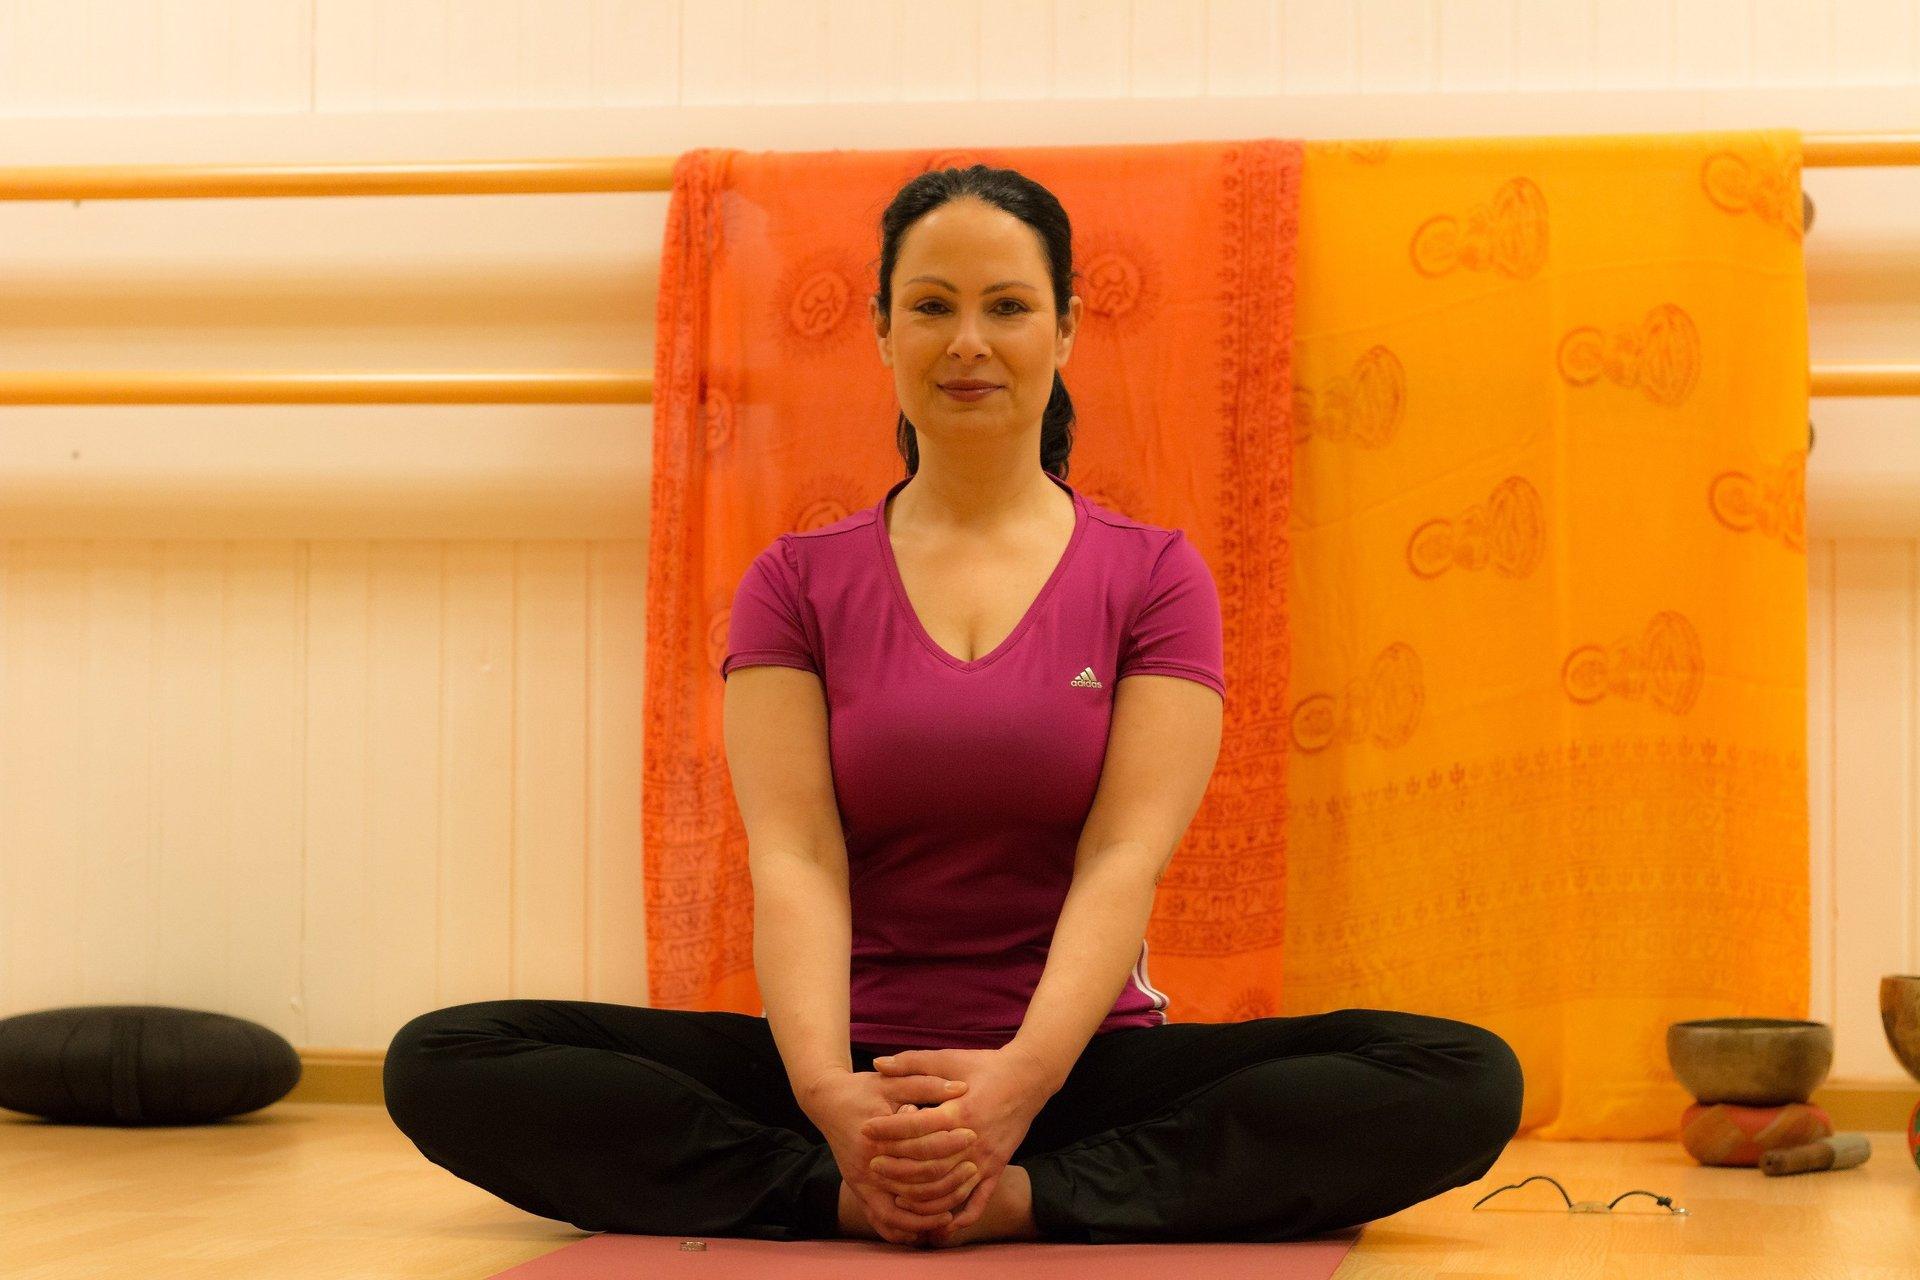 Yoga in Bad Homburg, Yogaunterricht, Yogalehrerausbildung